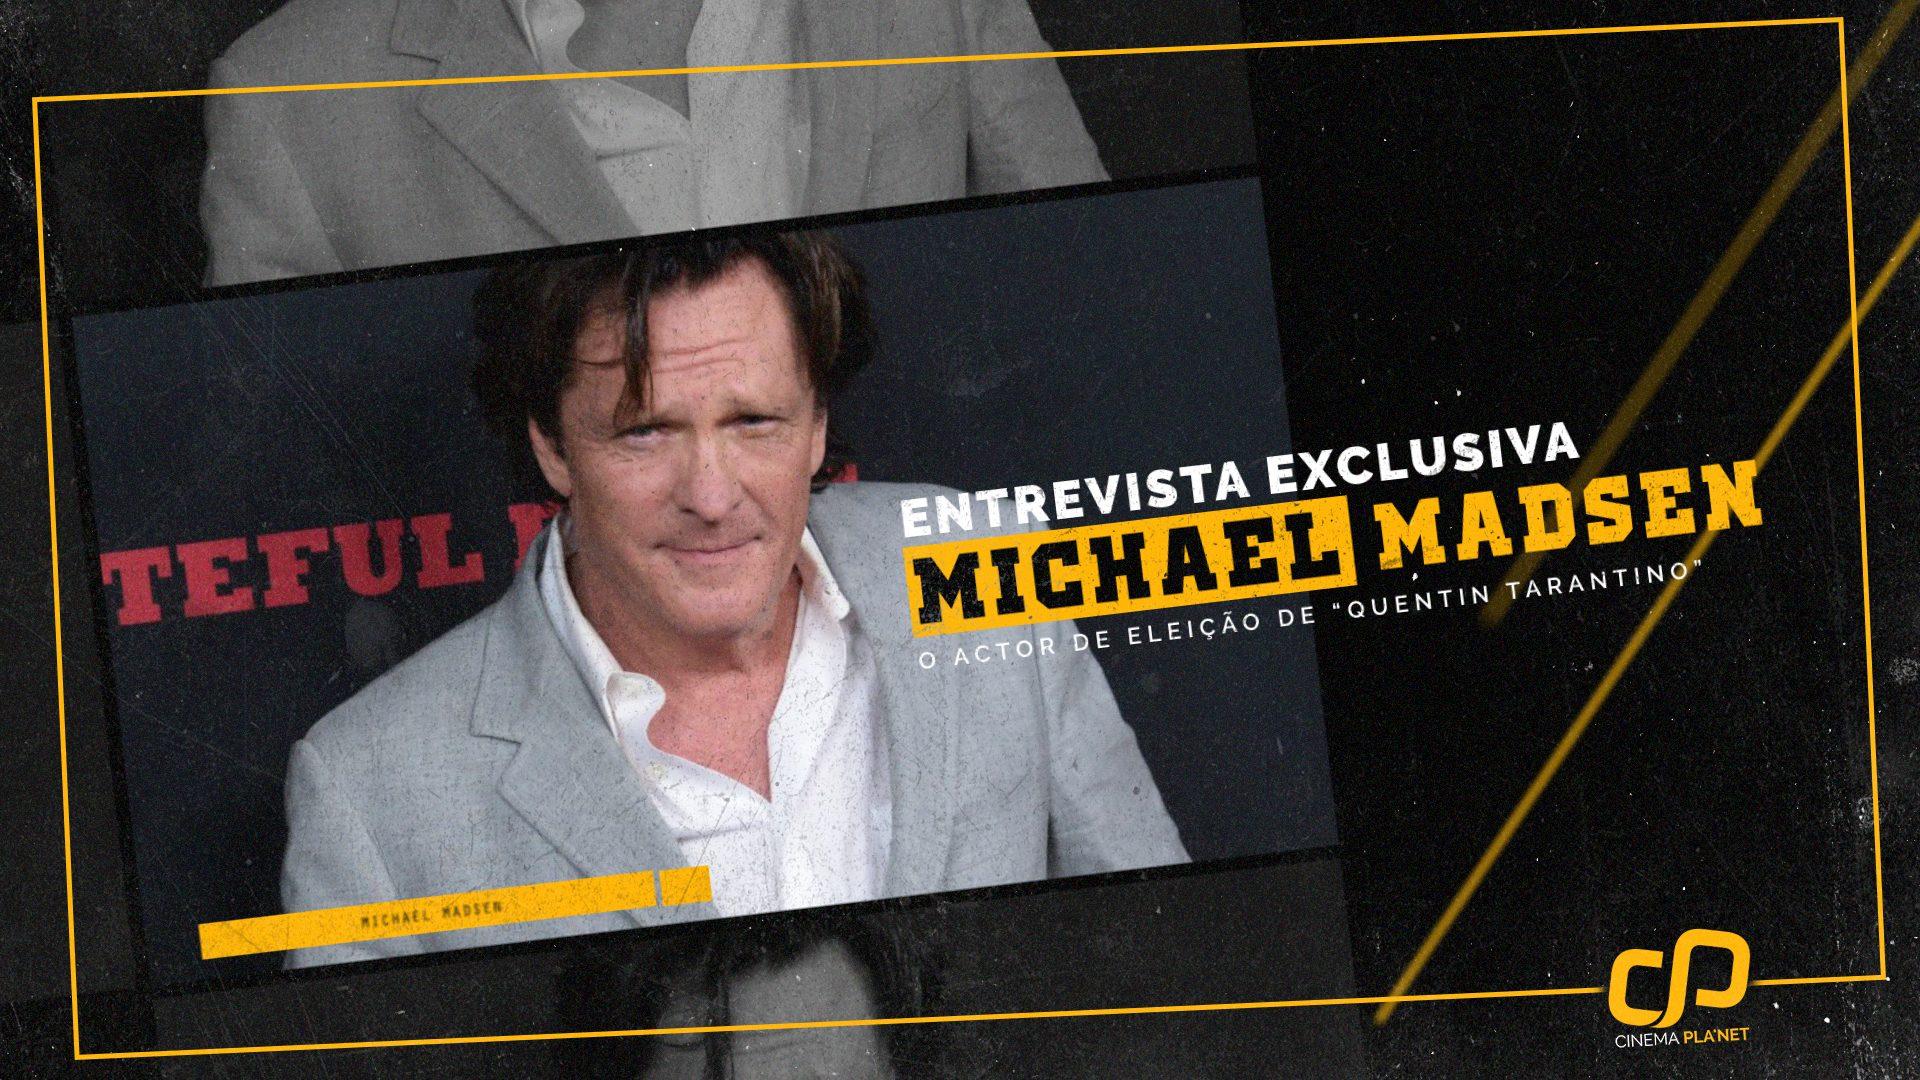 https://cinemaplanet.pt/wp-content/uploads/2017/09/MICHAEL_MADSEN_INTERVIEW.jpg